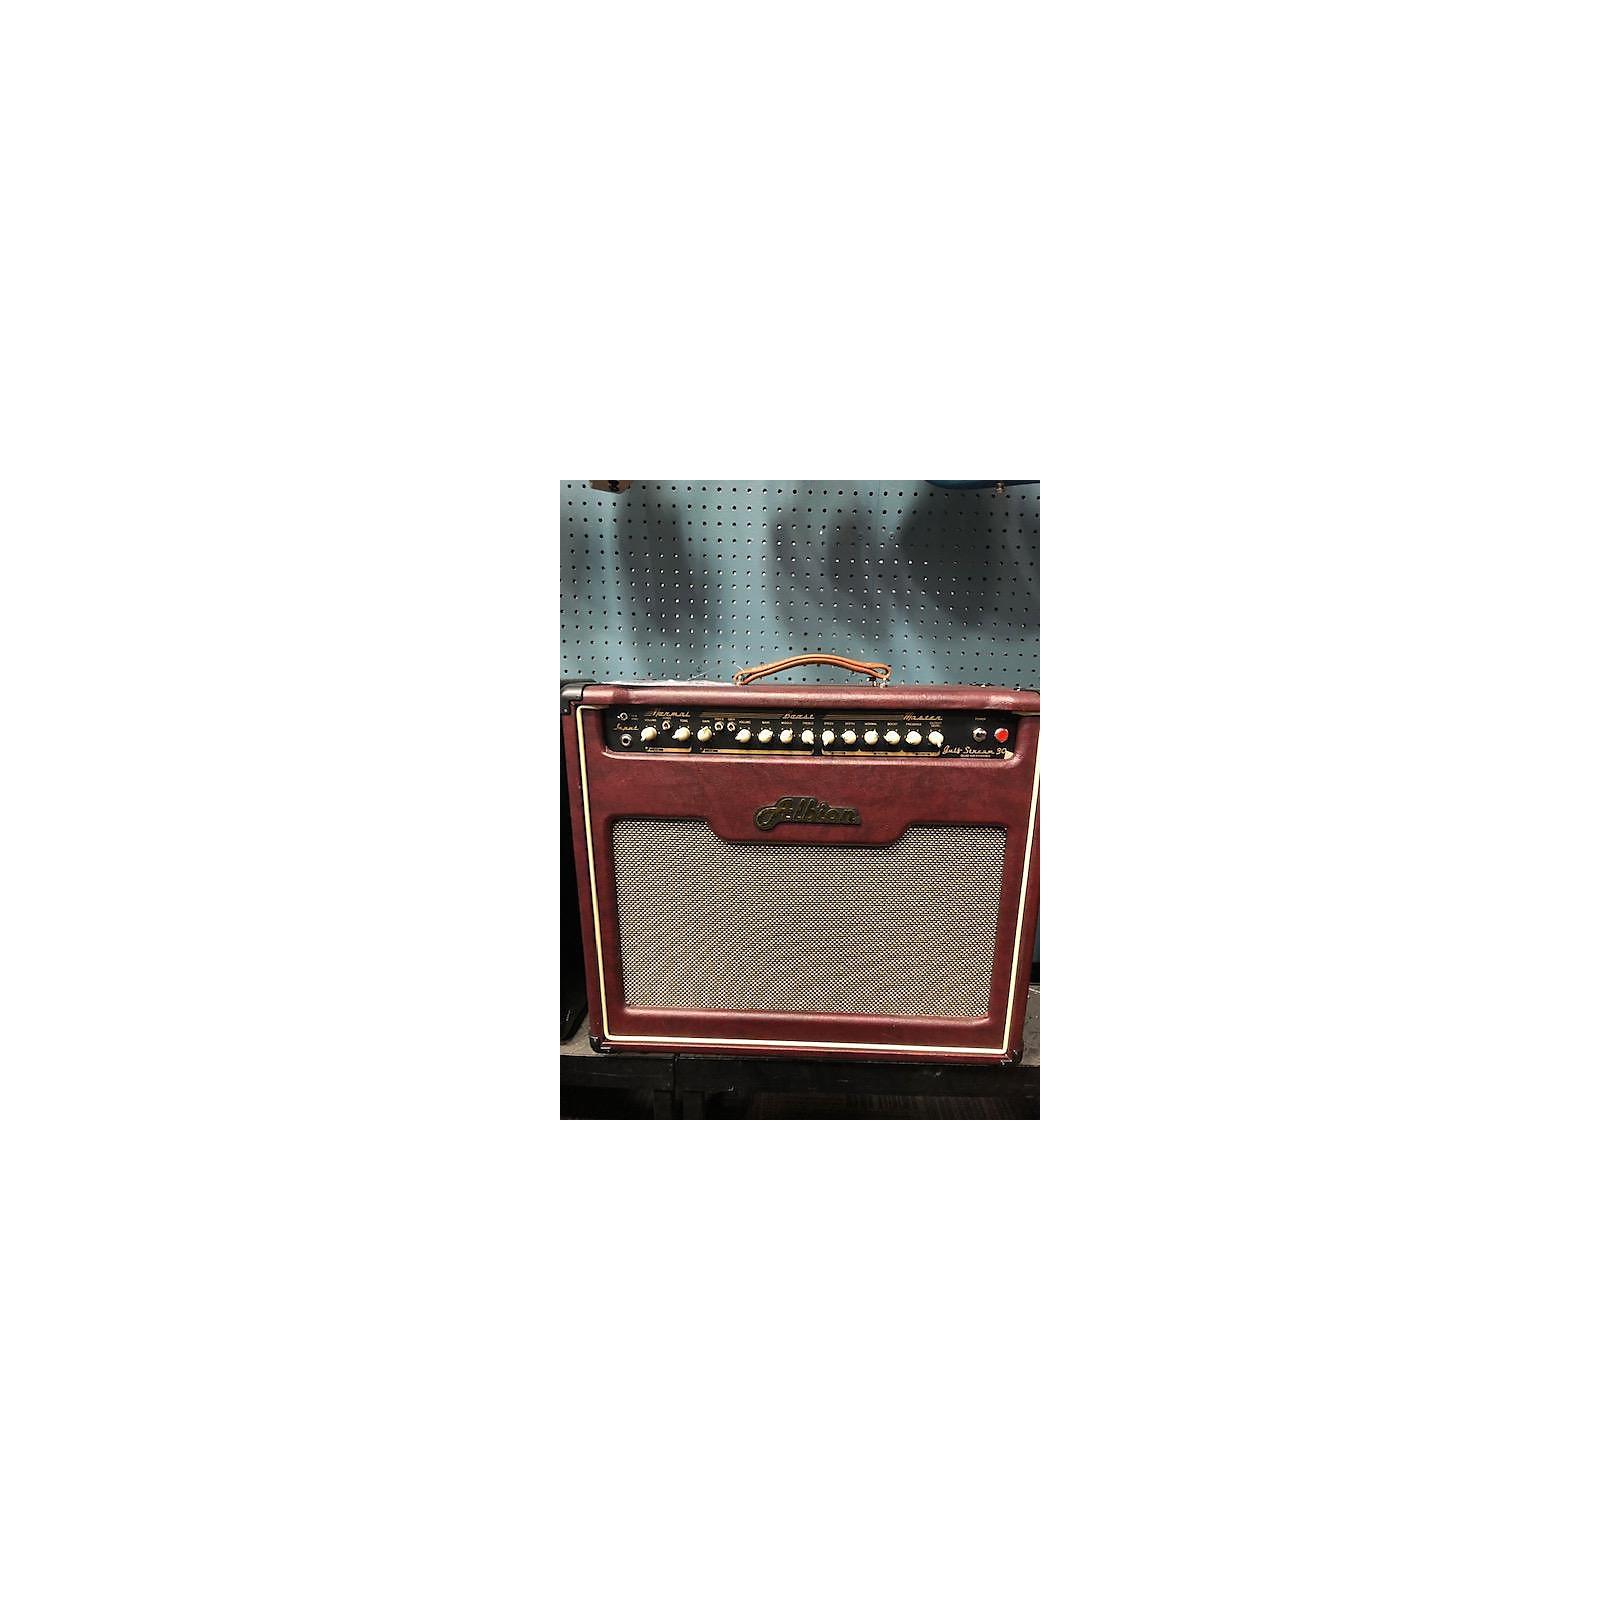 Albion Amplification GS30C Tube Guitar Combo Amp